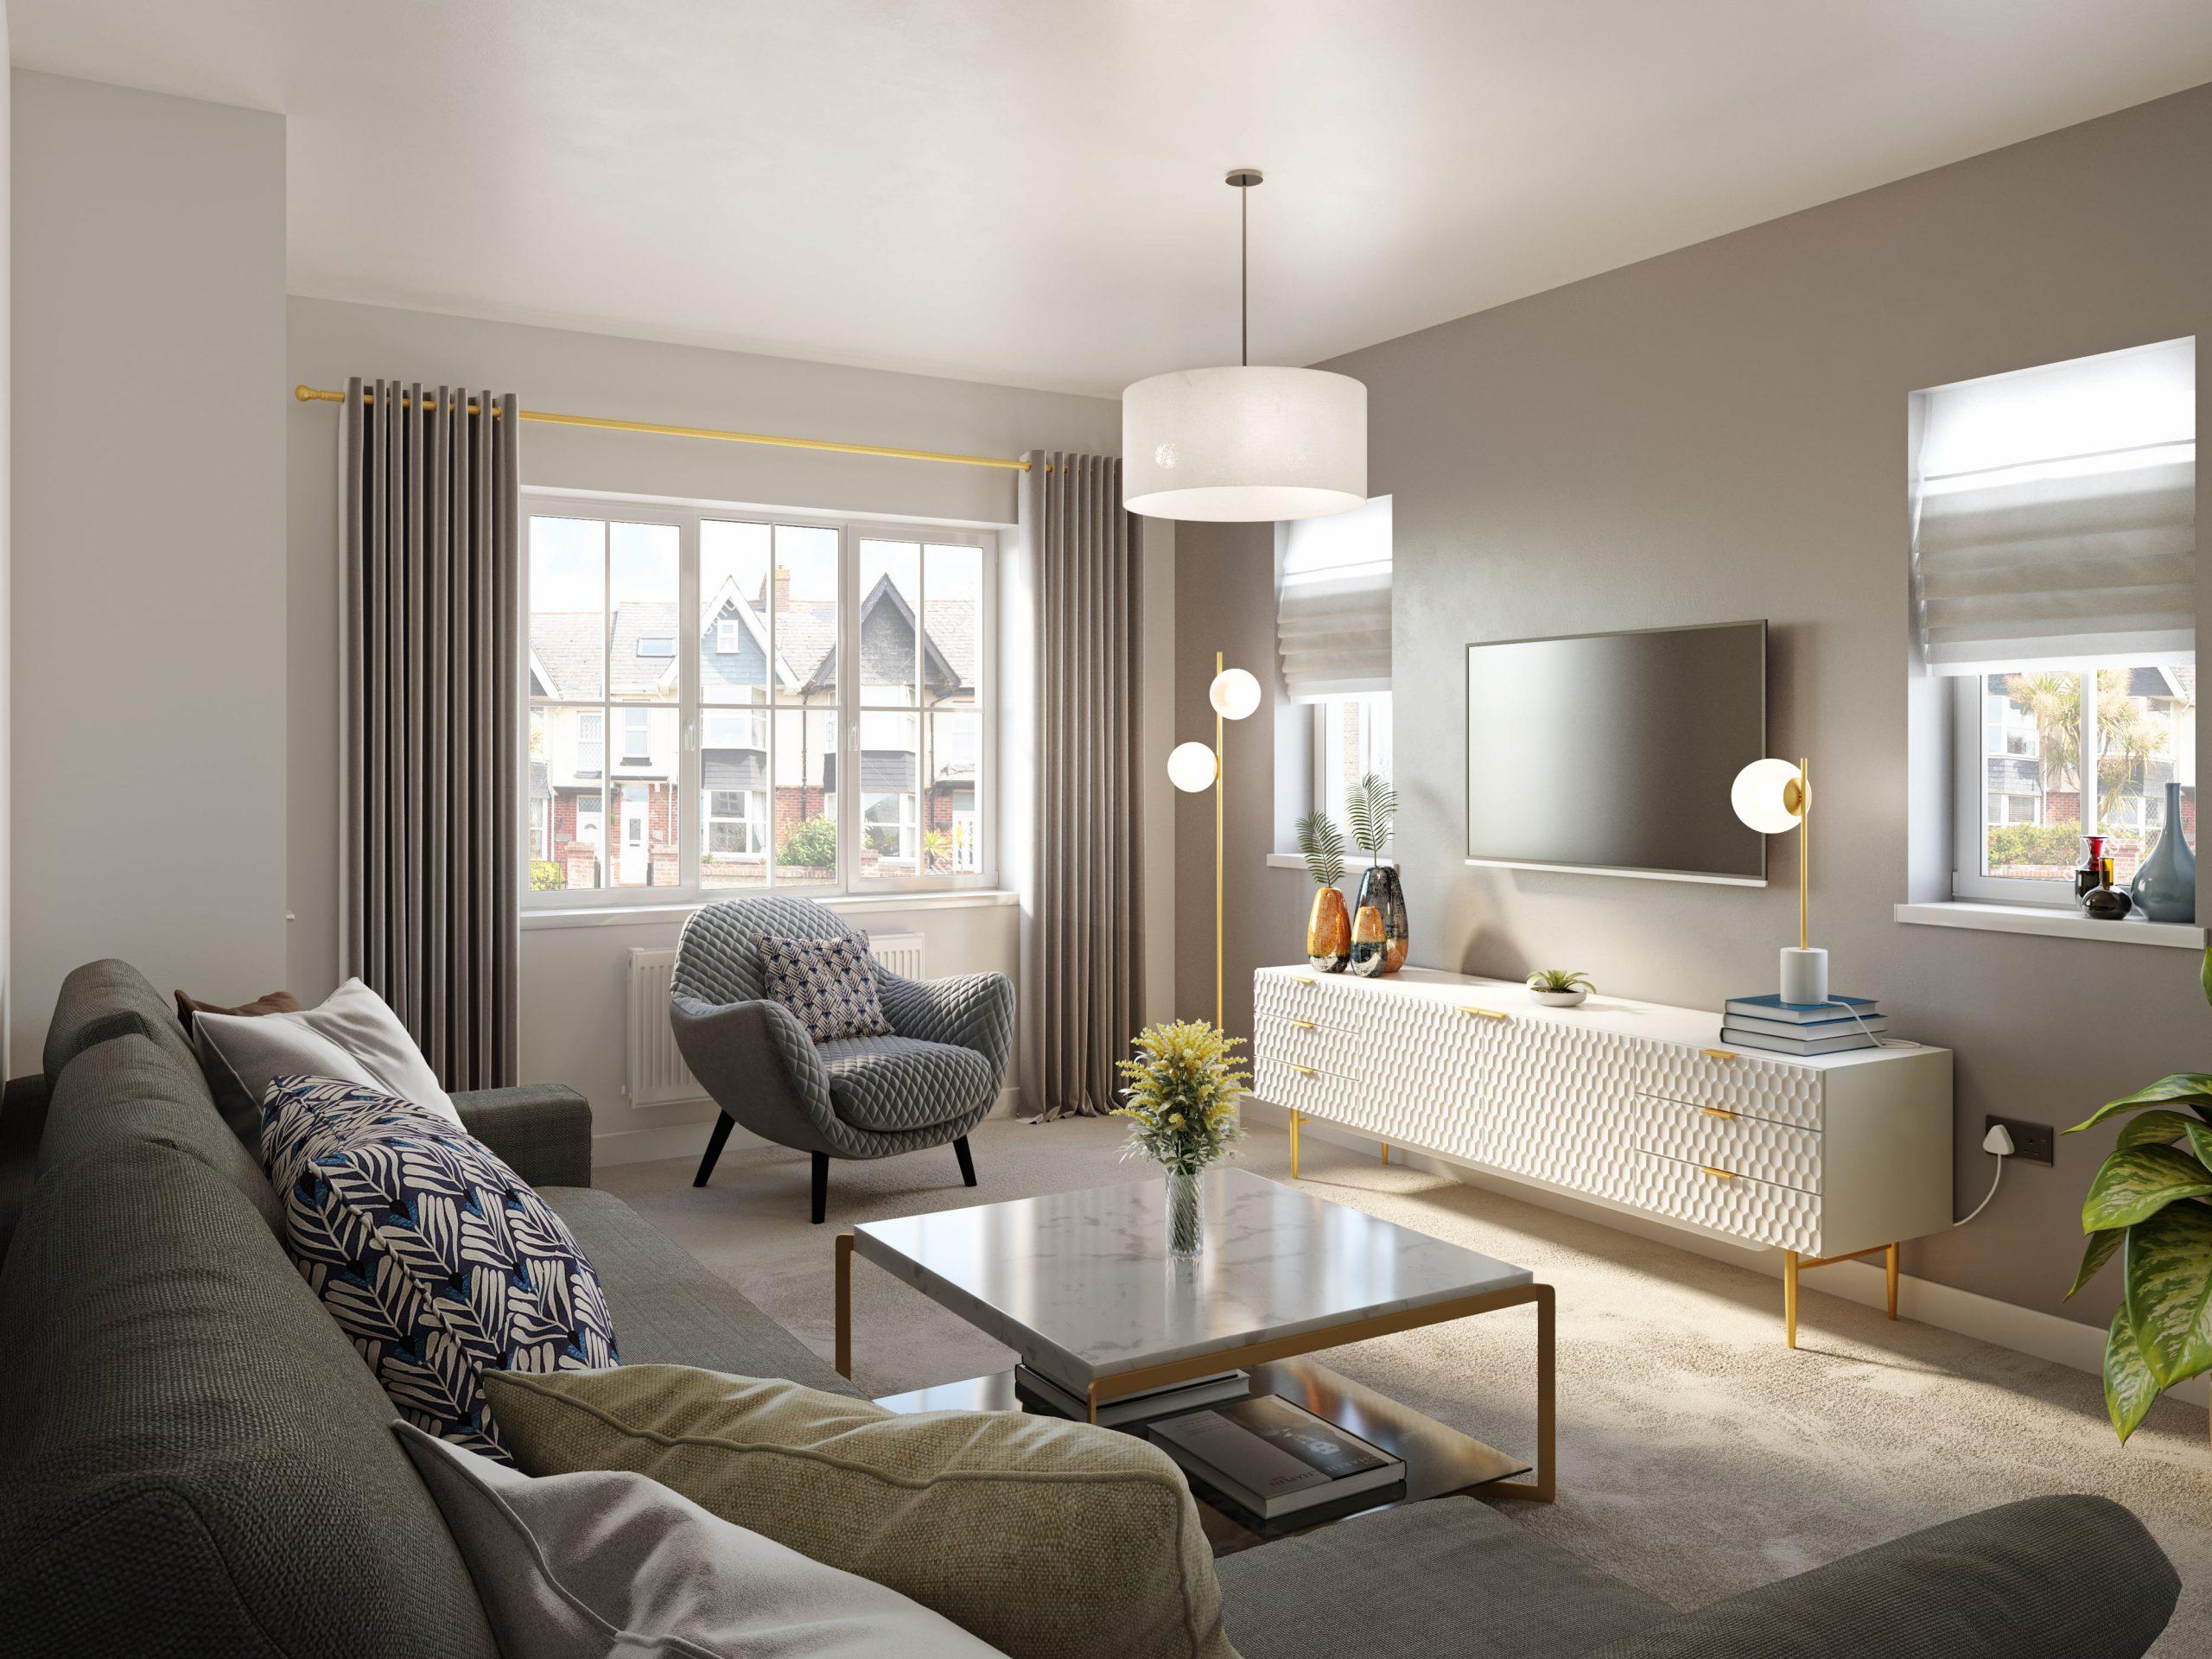 living room visualisation - housing development